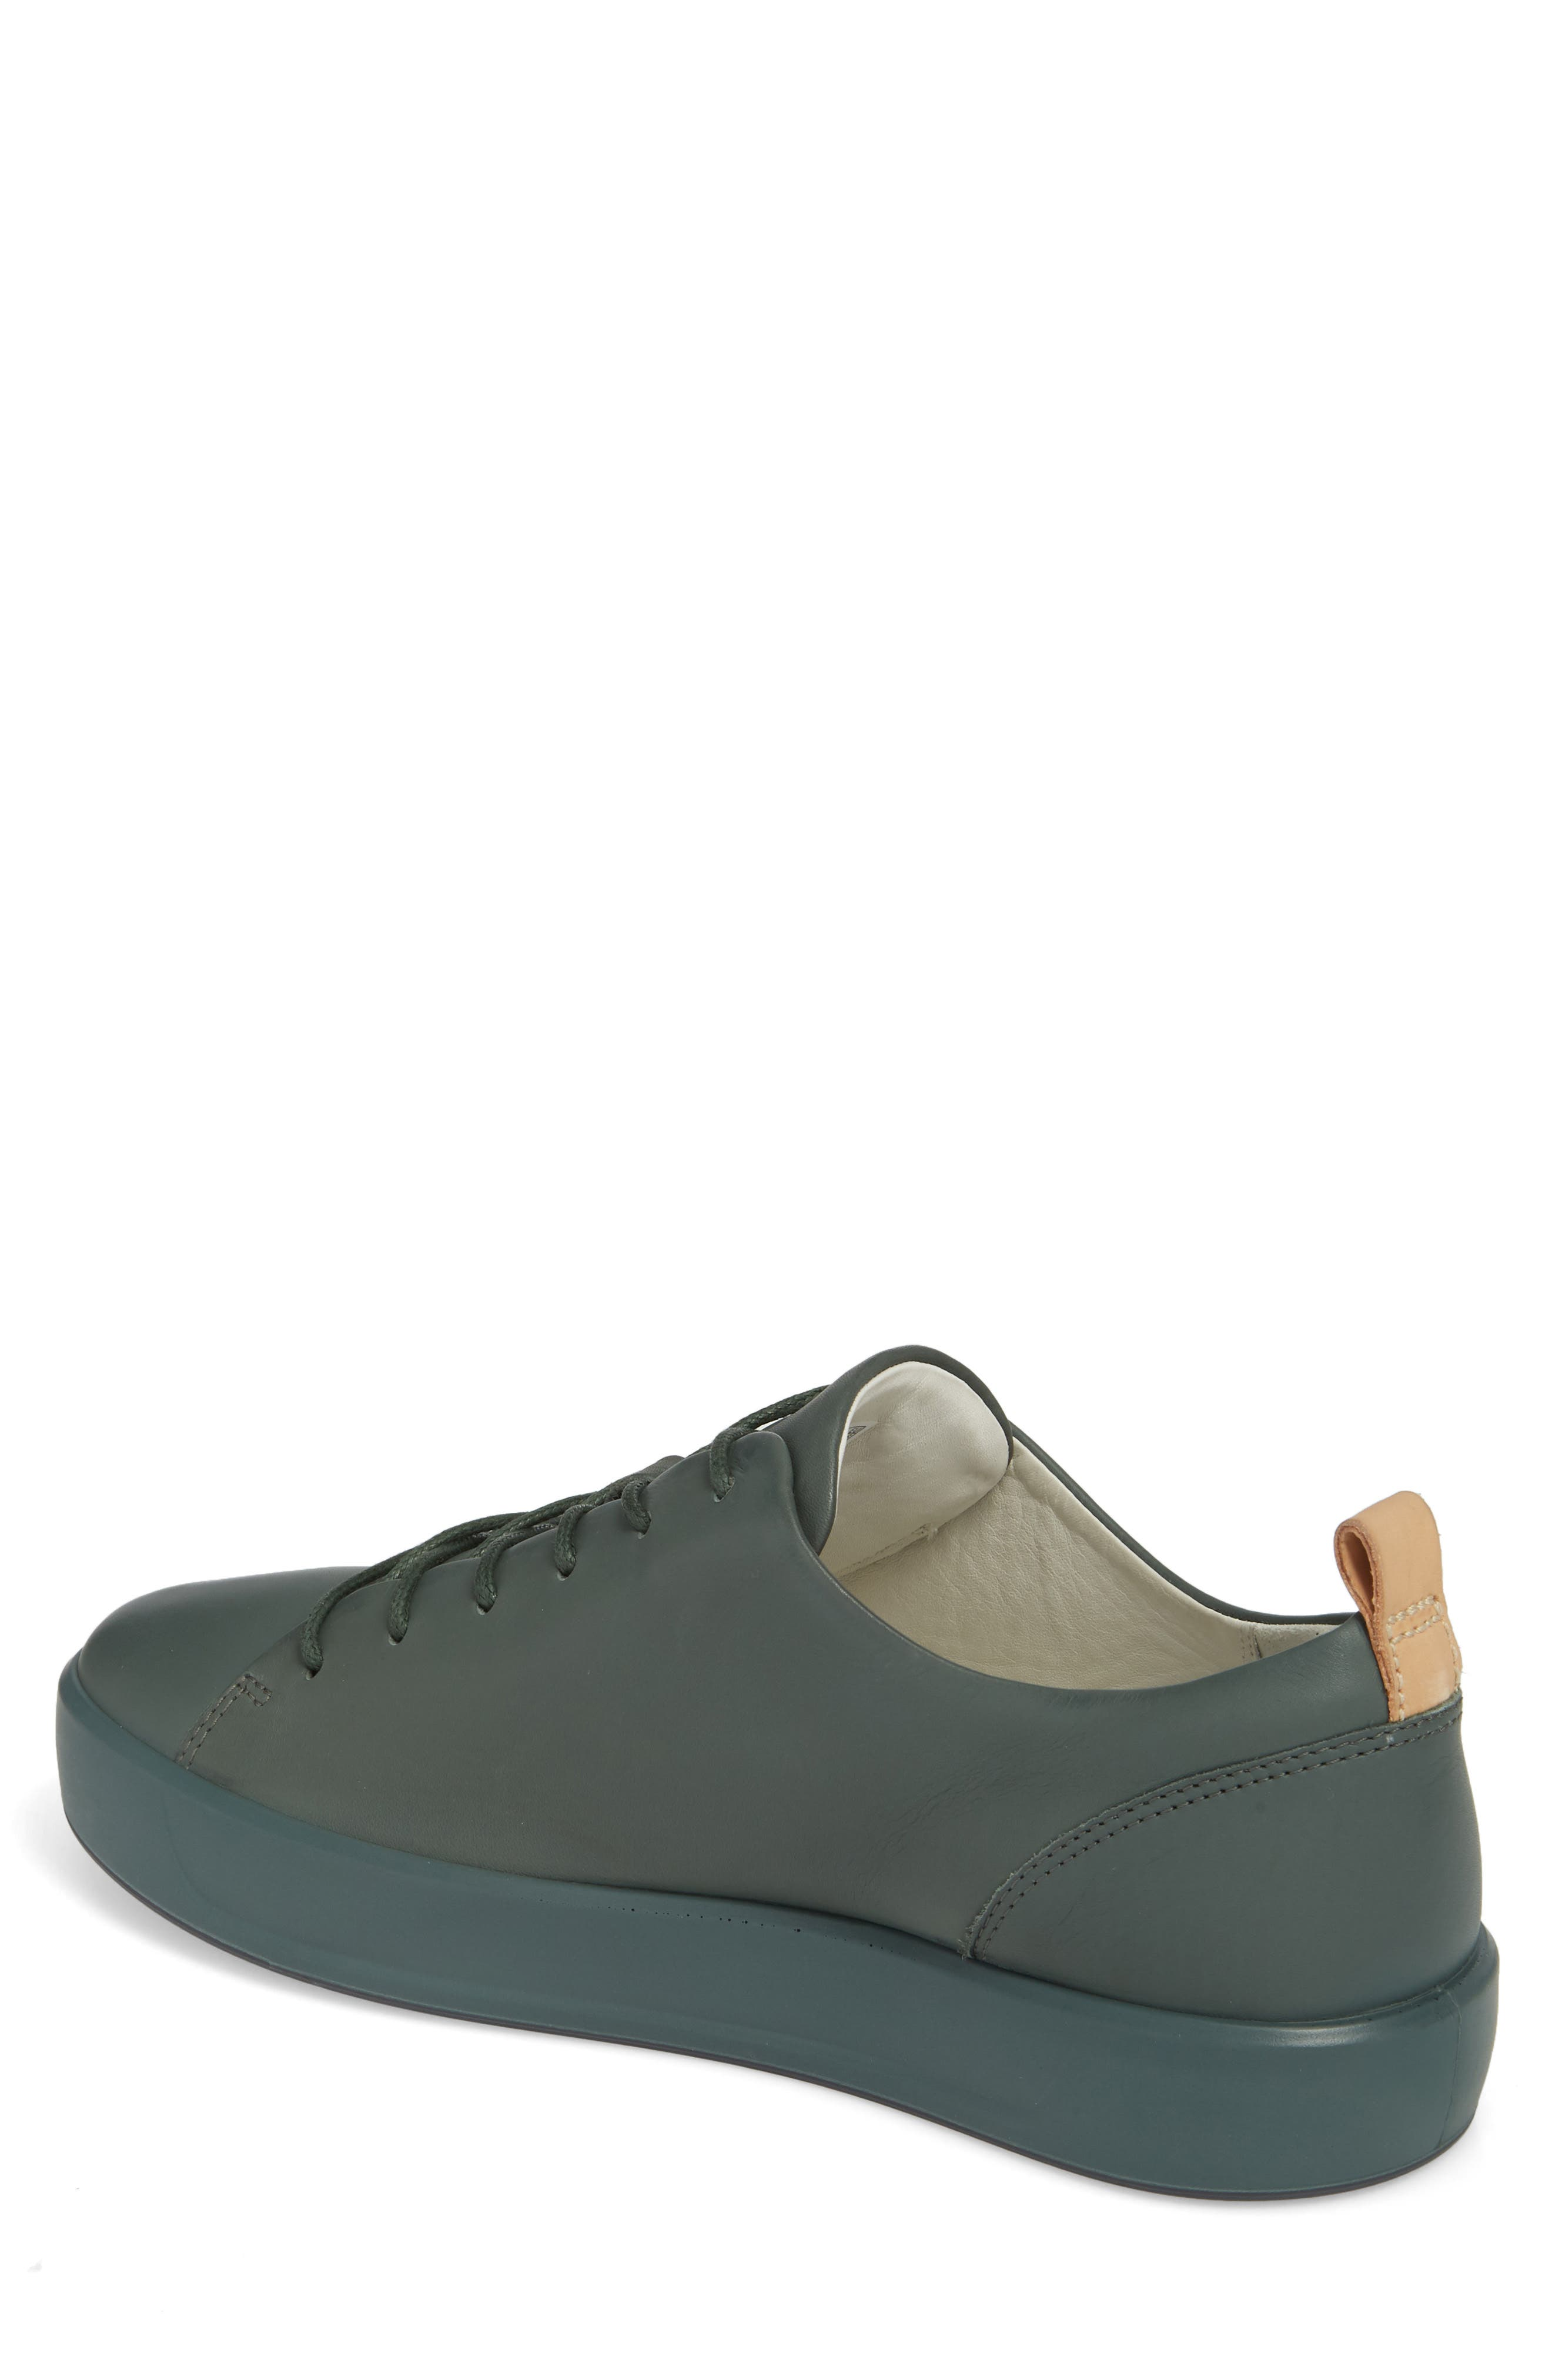 Soft 8 Low Top Sneaker,                             Alternate thumbnail 6, color,